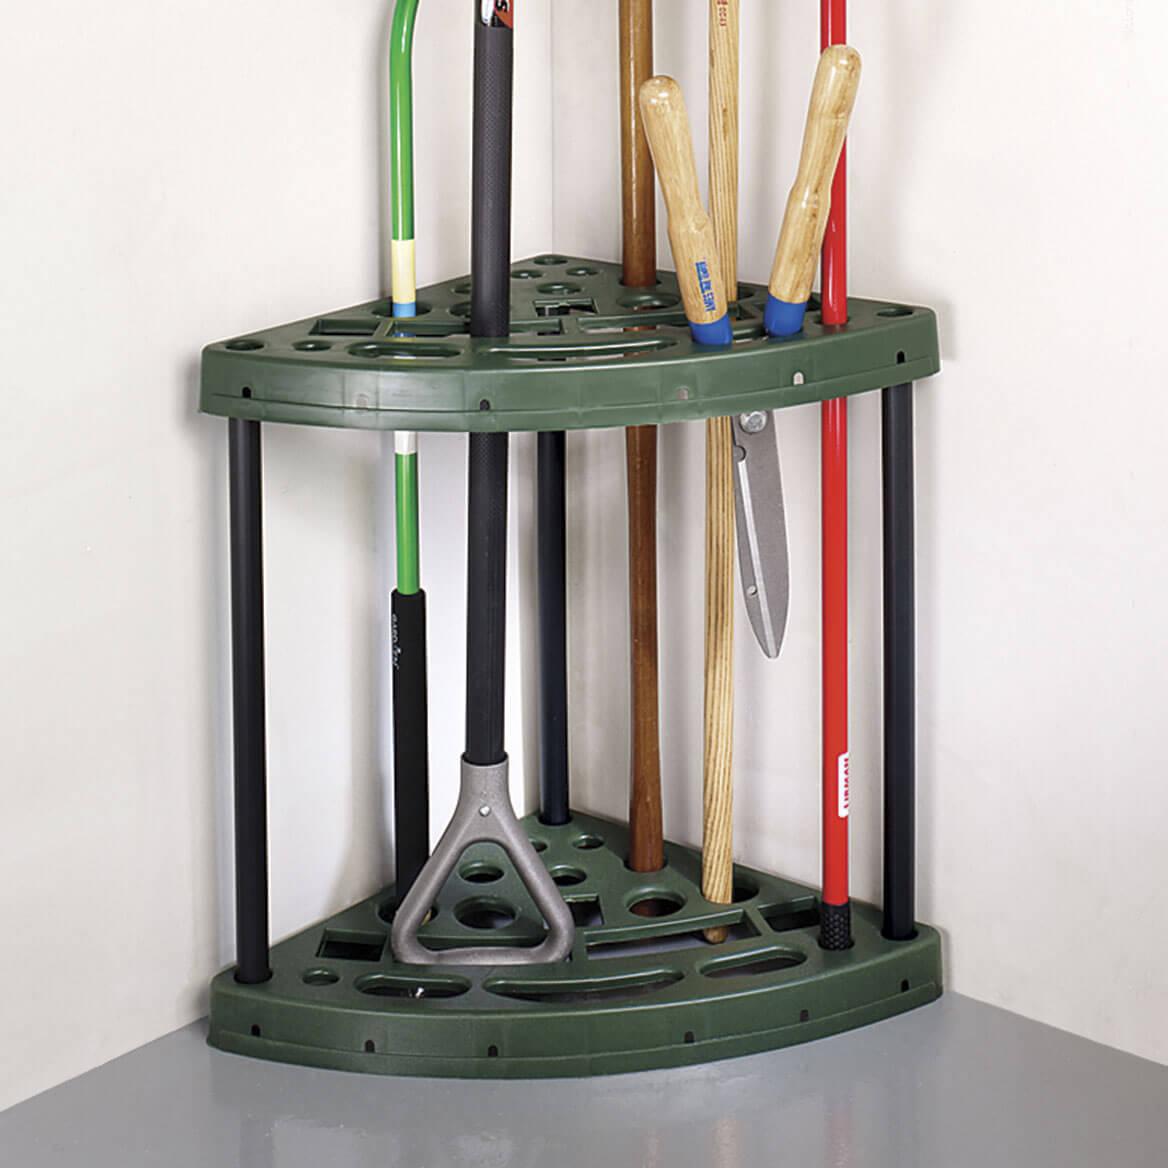 select quantity saved to wishlist save to wishlist add to cart description this space saving corner garden tool rack - Garden Tool Rack